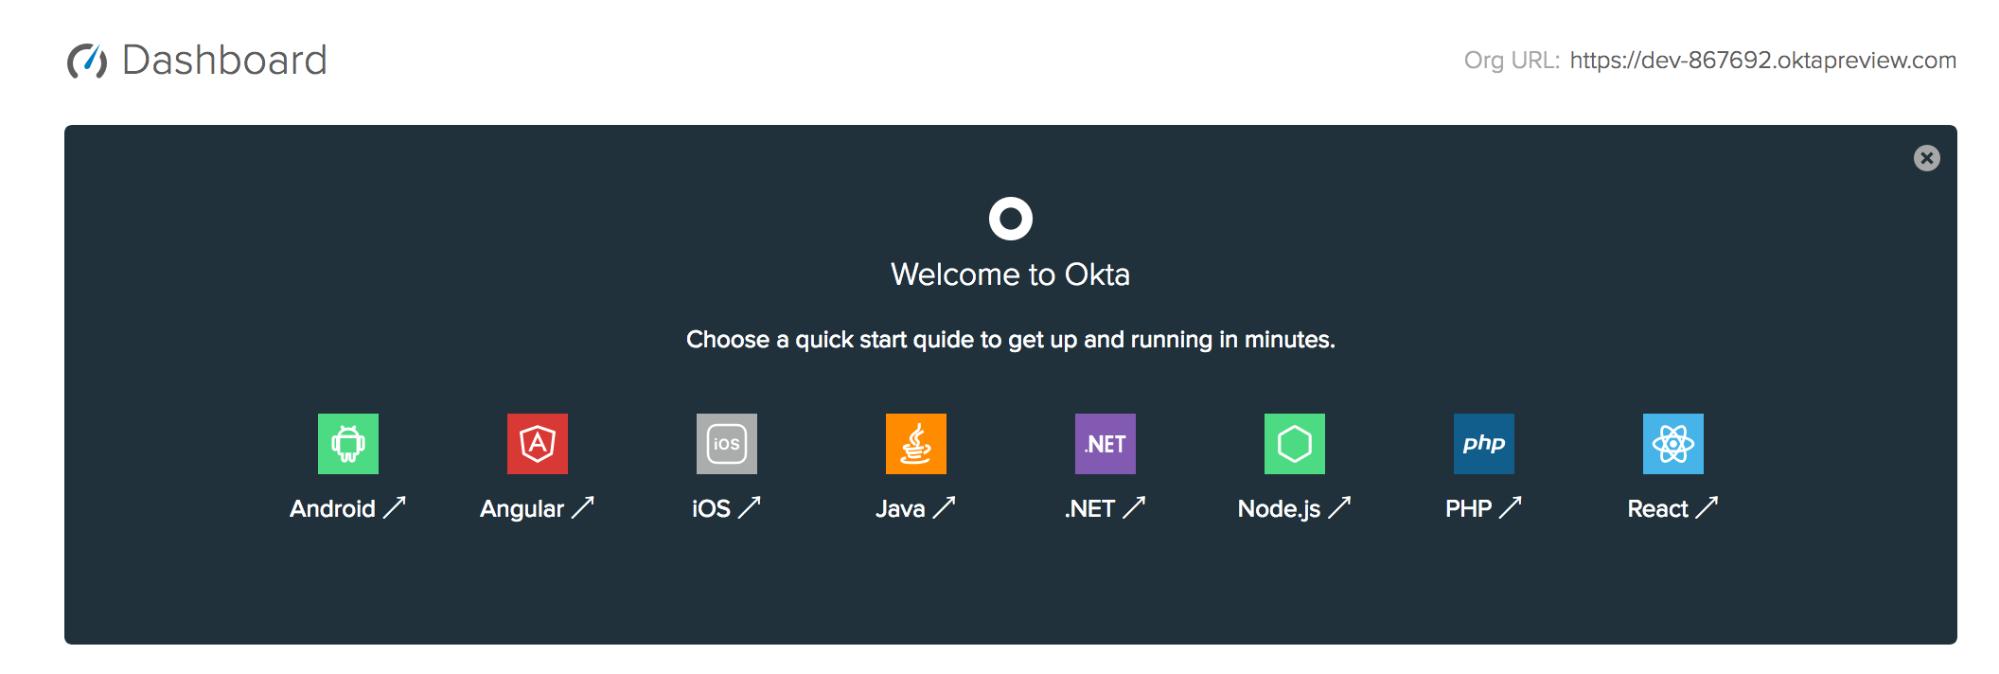 Okta dashboard org URL